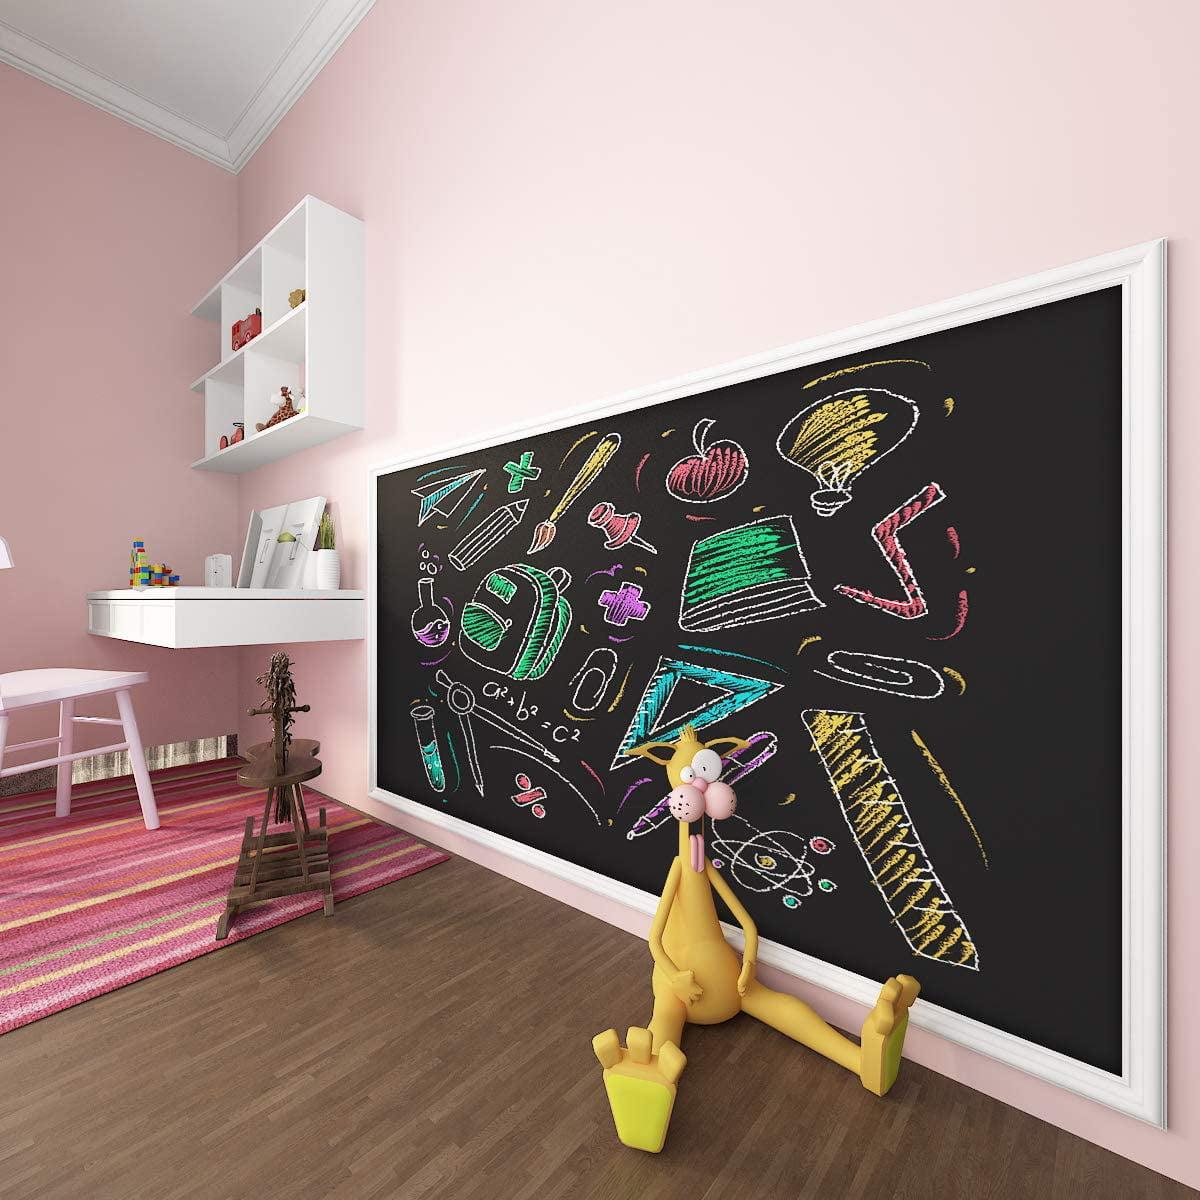 Large Blackboard 60x 200cm Removable Wall Sticker Chalkboard Decal Free ChaHFUK